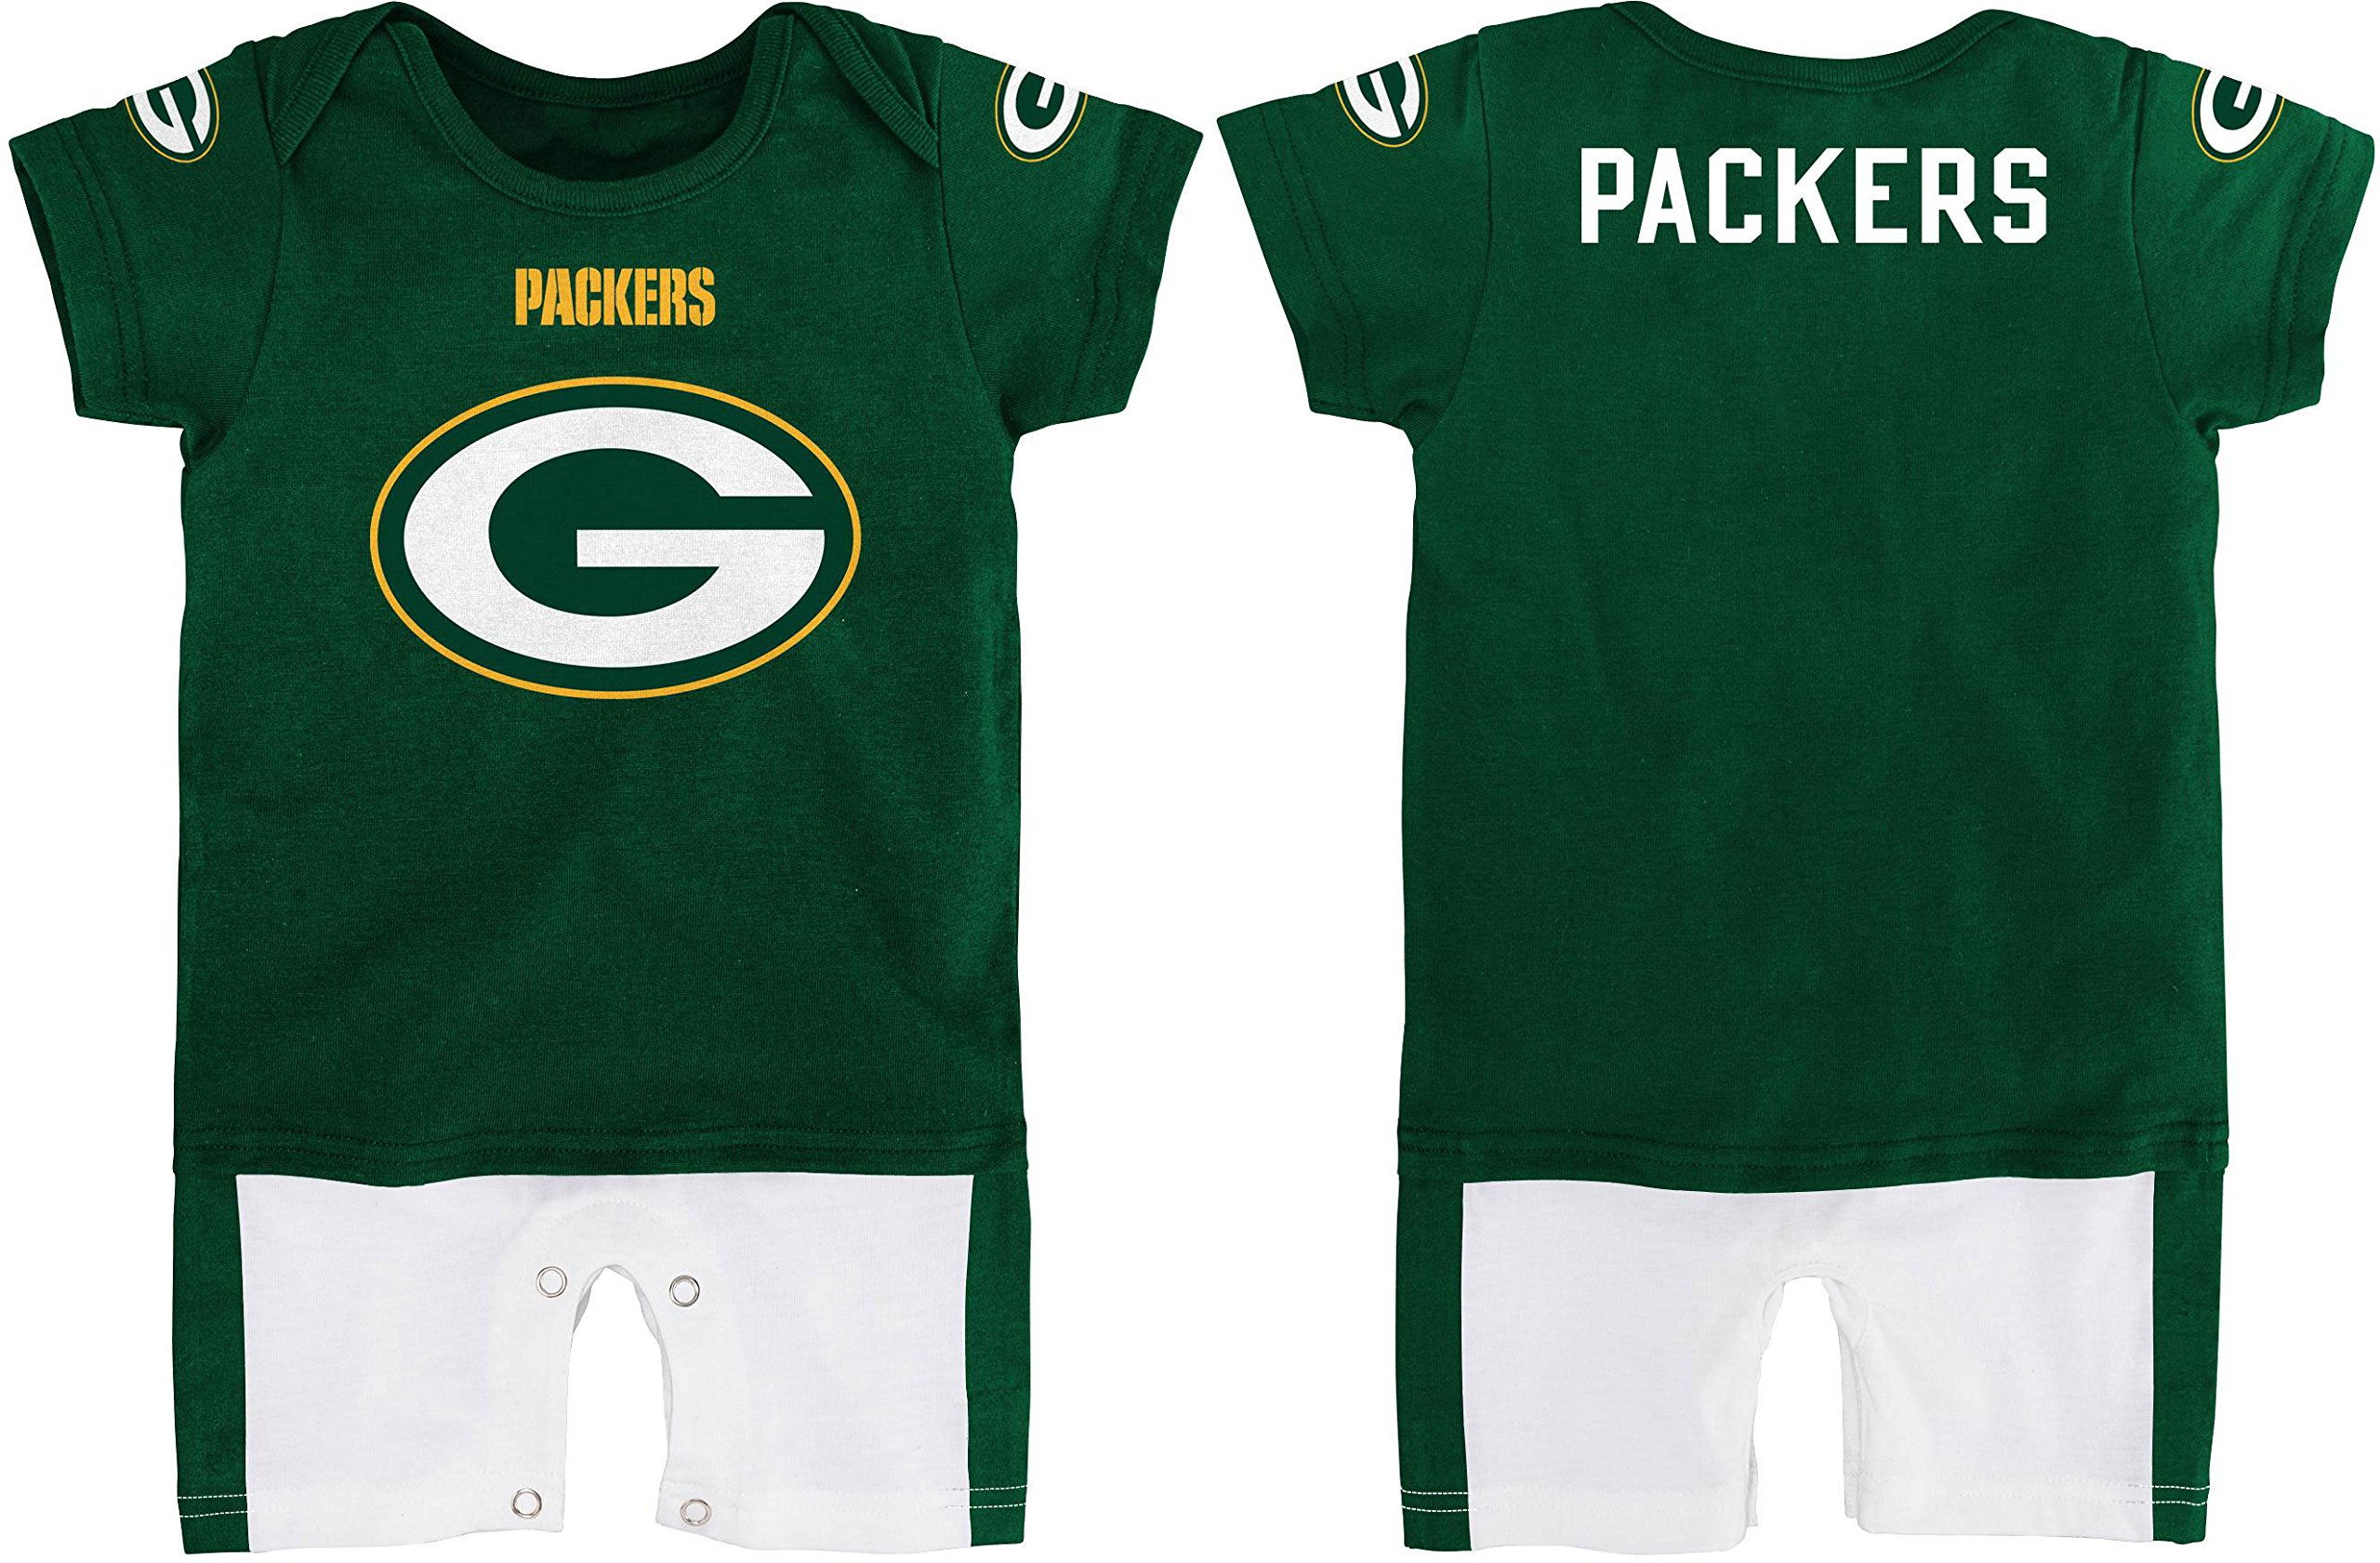 e22e84fc4 Outerstuff Green Bay Packers Baby Infant Fan Jersey Romper 0-3 Months  91HqDCguXOL